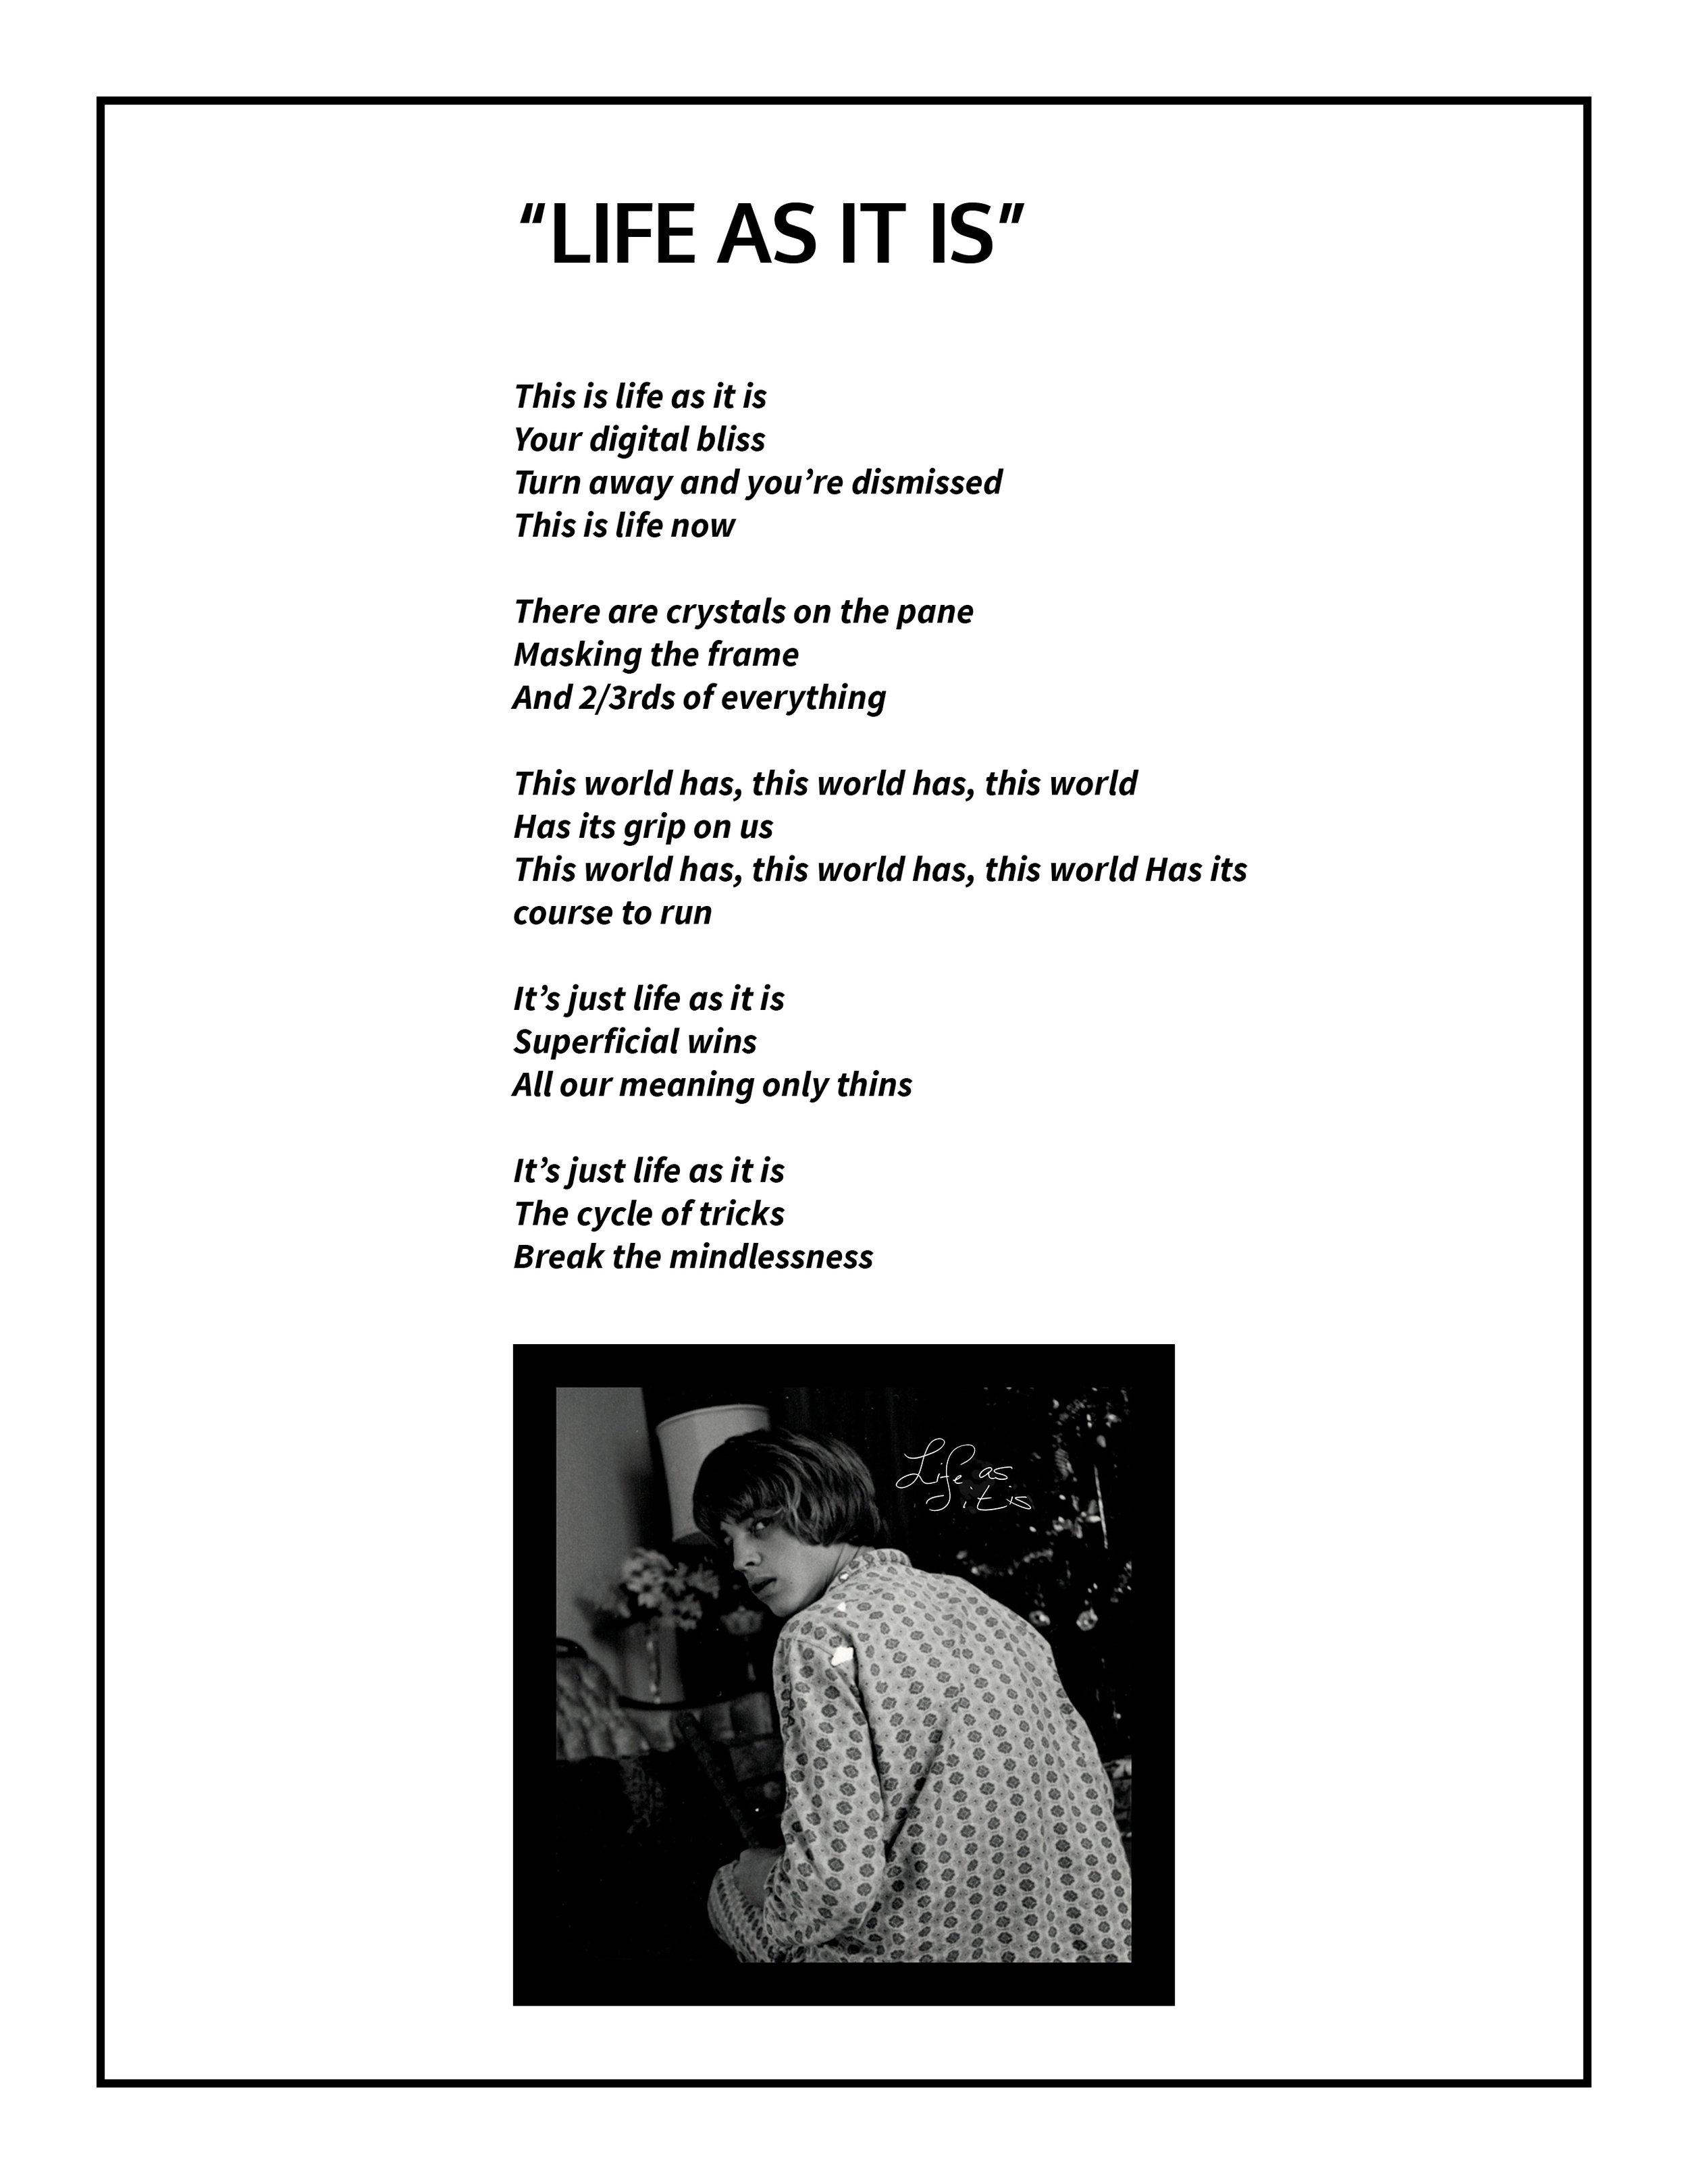 Life as it is Lyrics